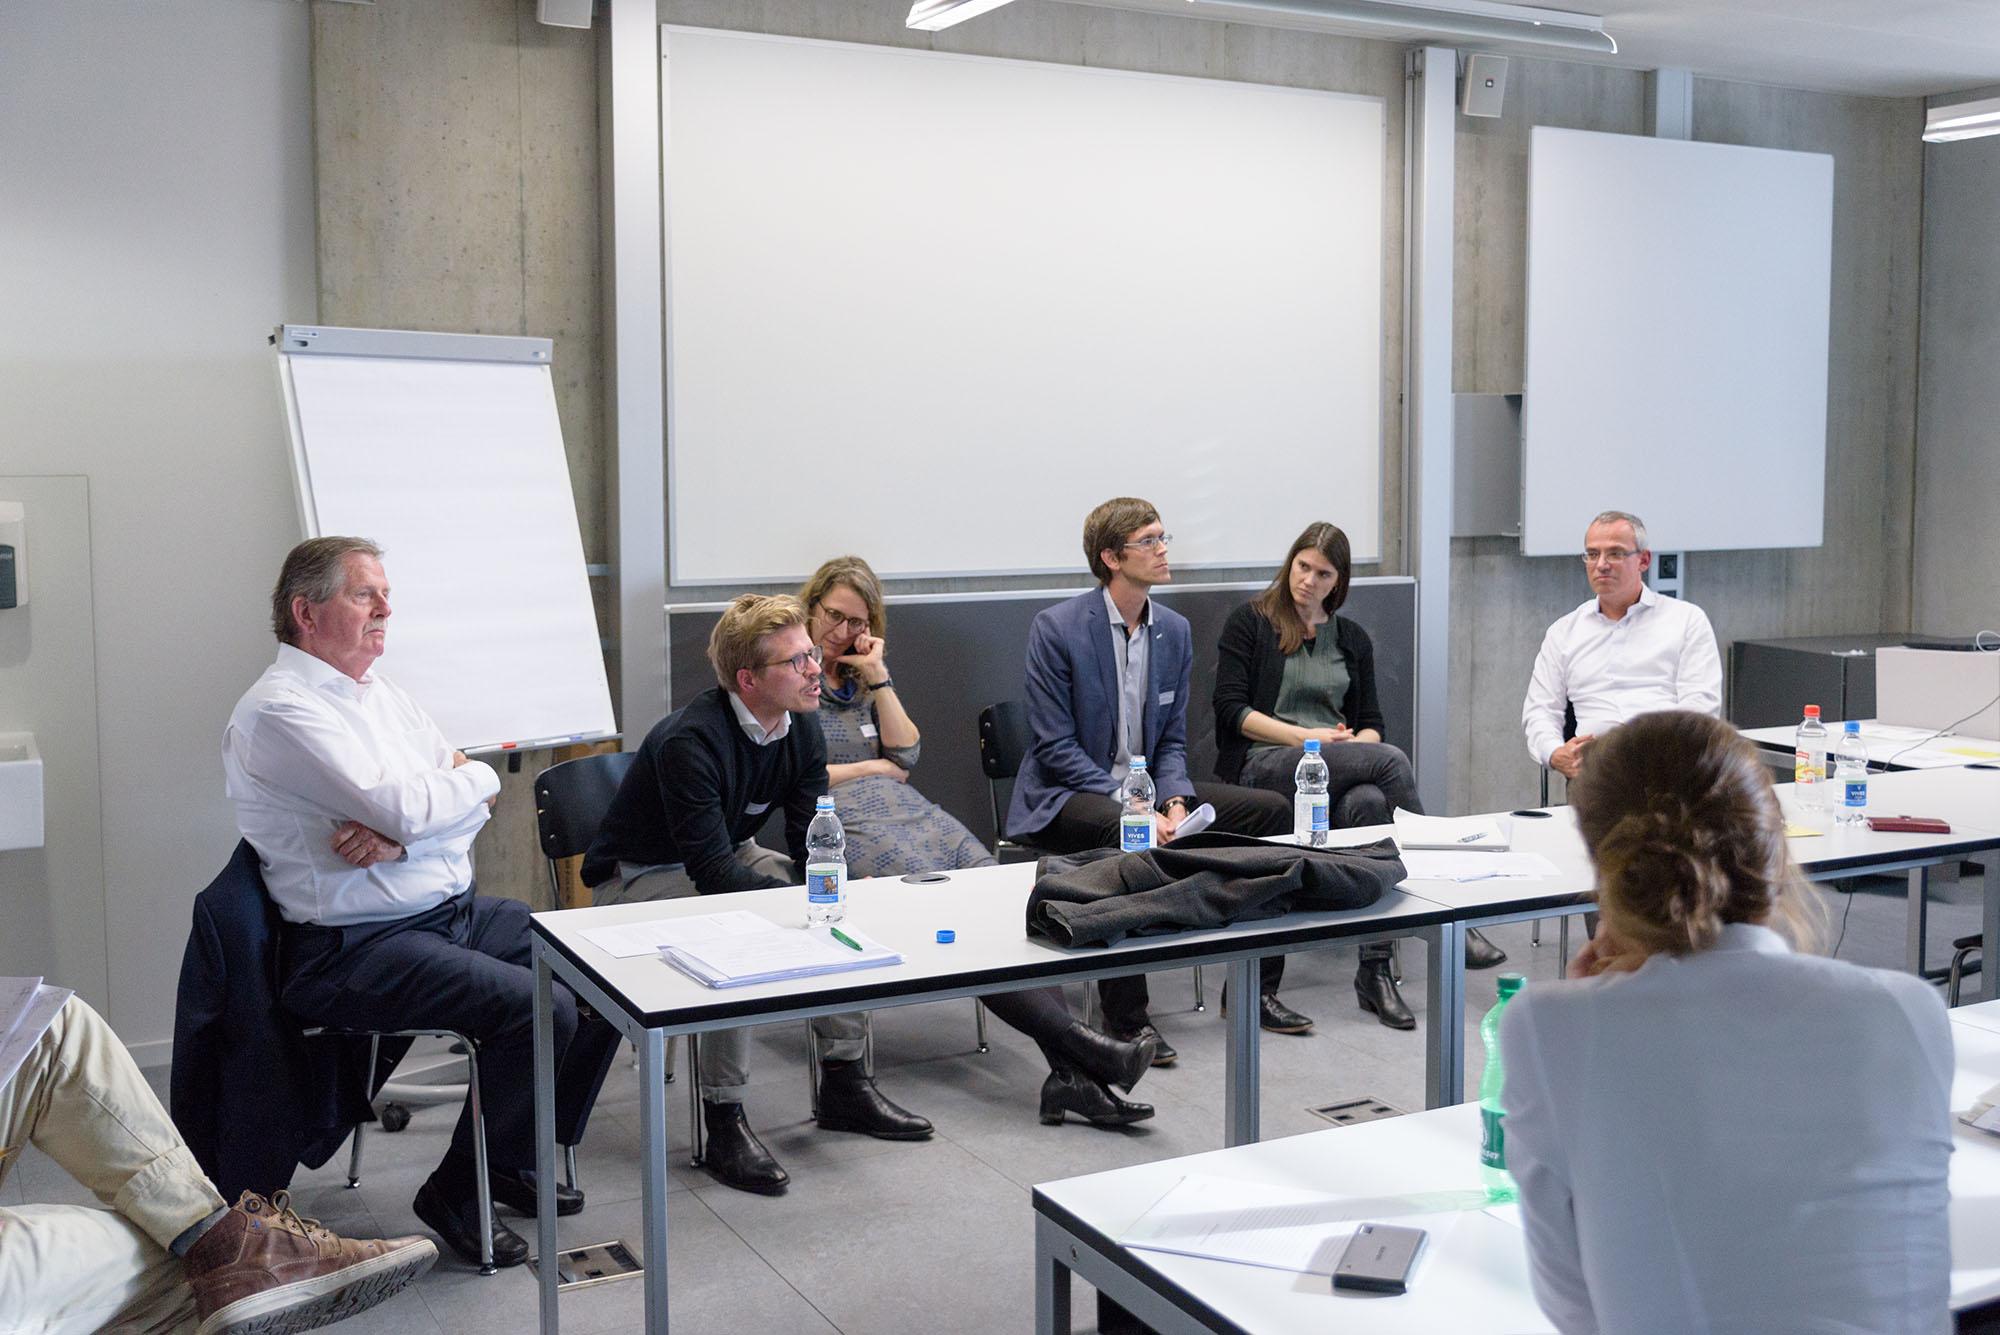 Roland Stulz, Lorenz Isler, Rahel Gessler, Christian Schmid, Alexandra Palzkill, Tobias Gerfin